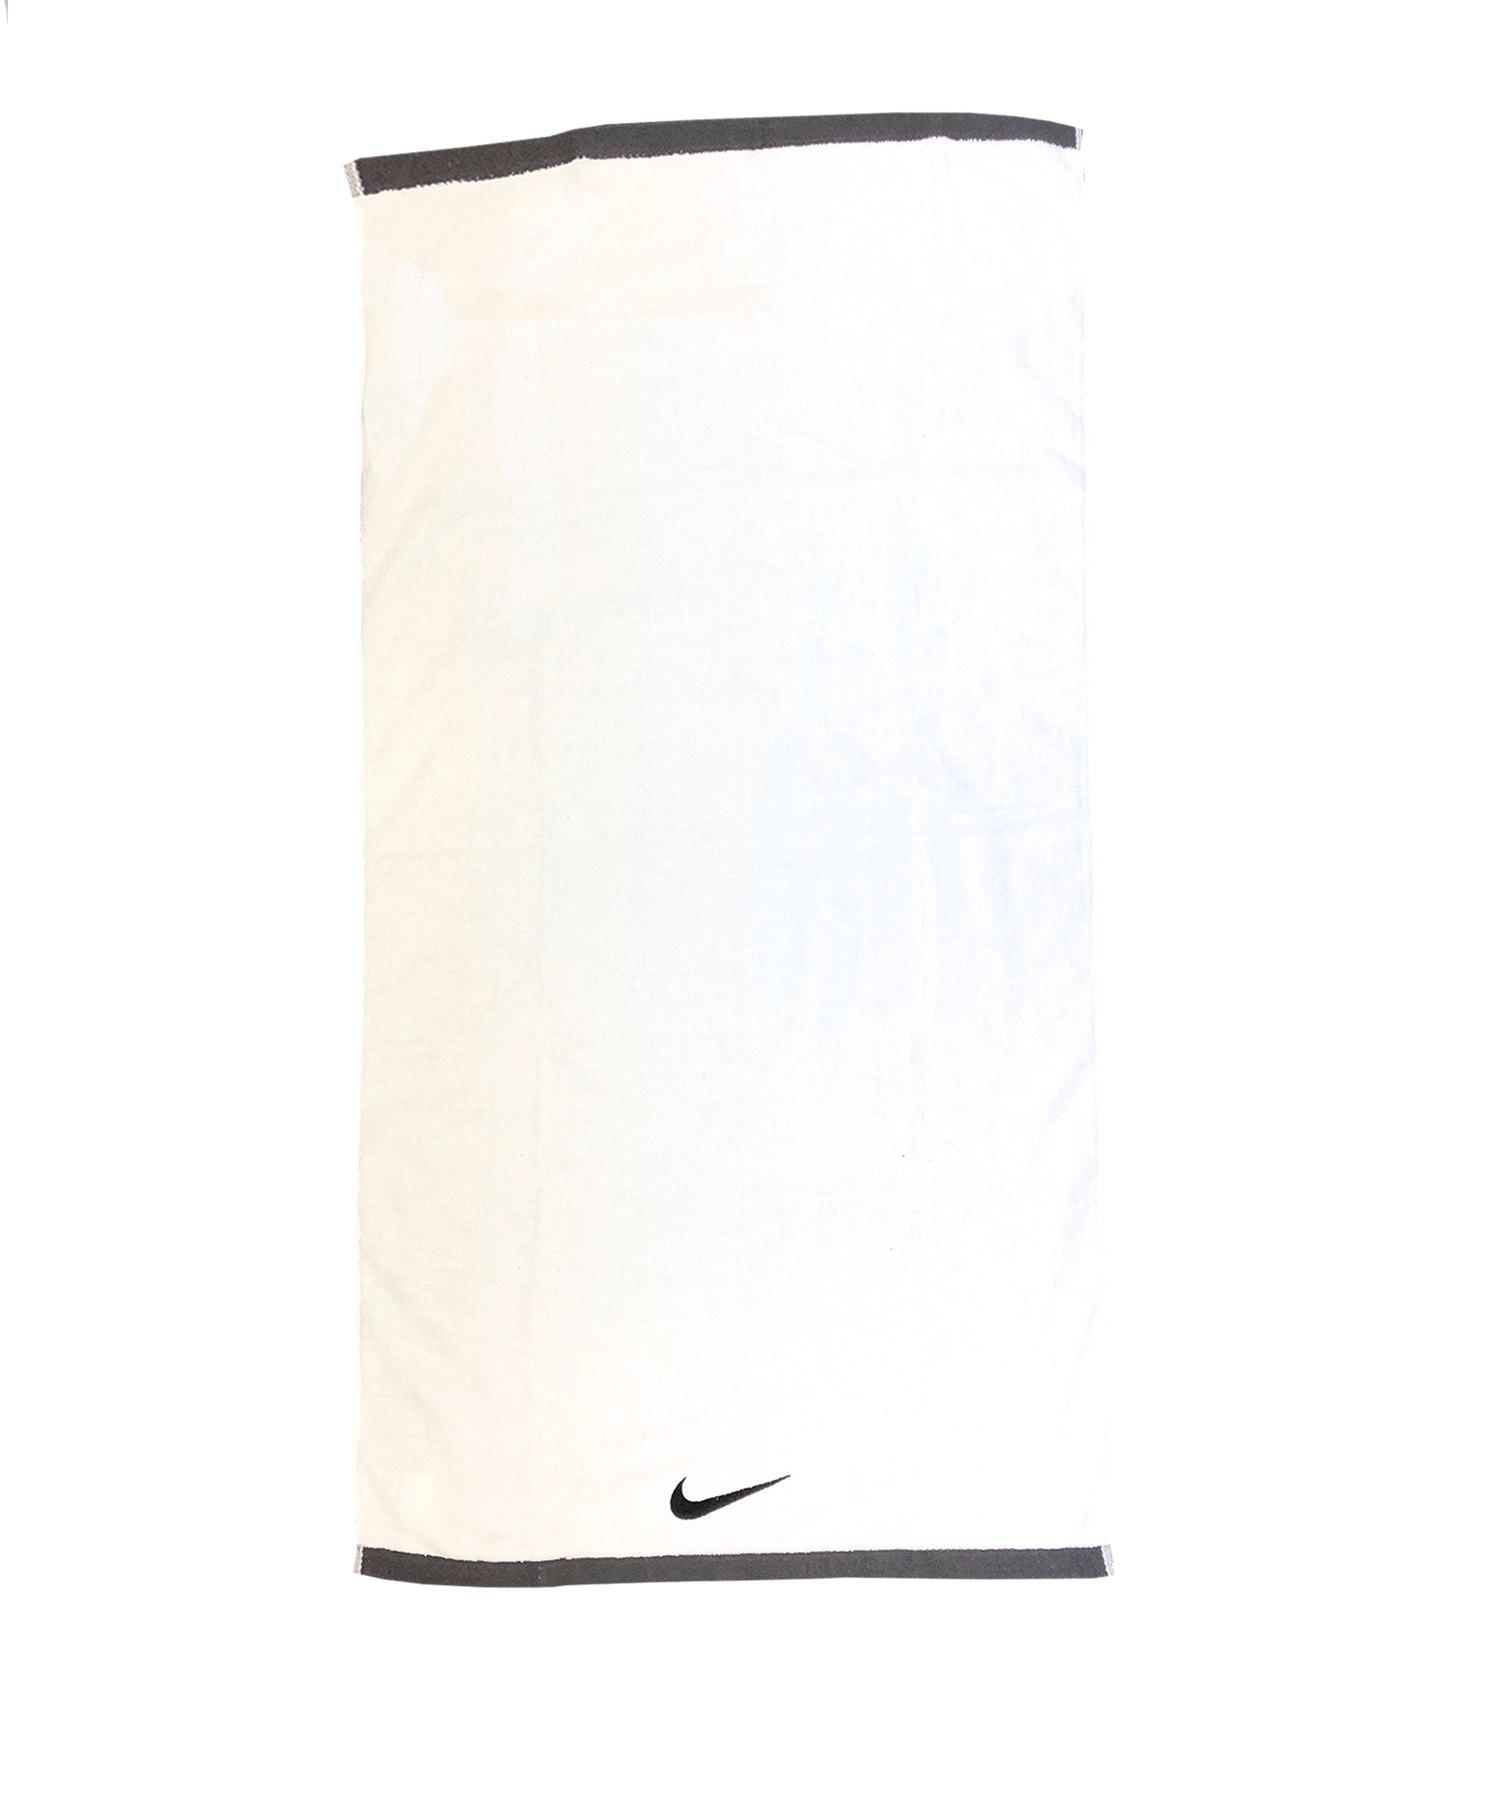 Nike Fundamental Towel Handtuch Weiss Schwarz F101 - weiss